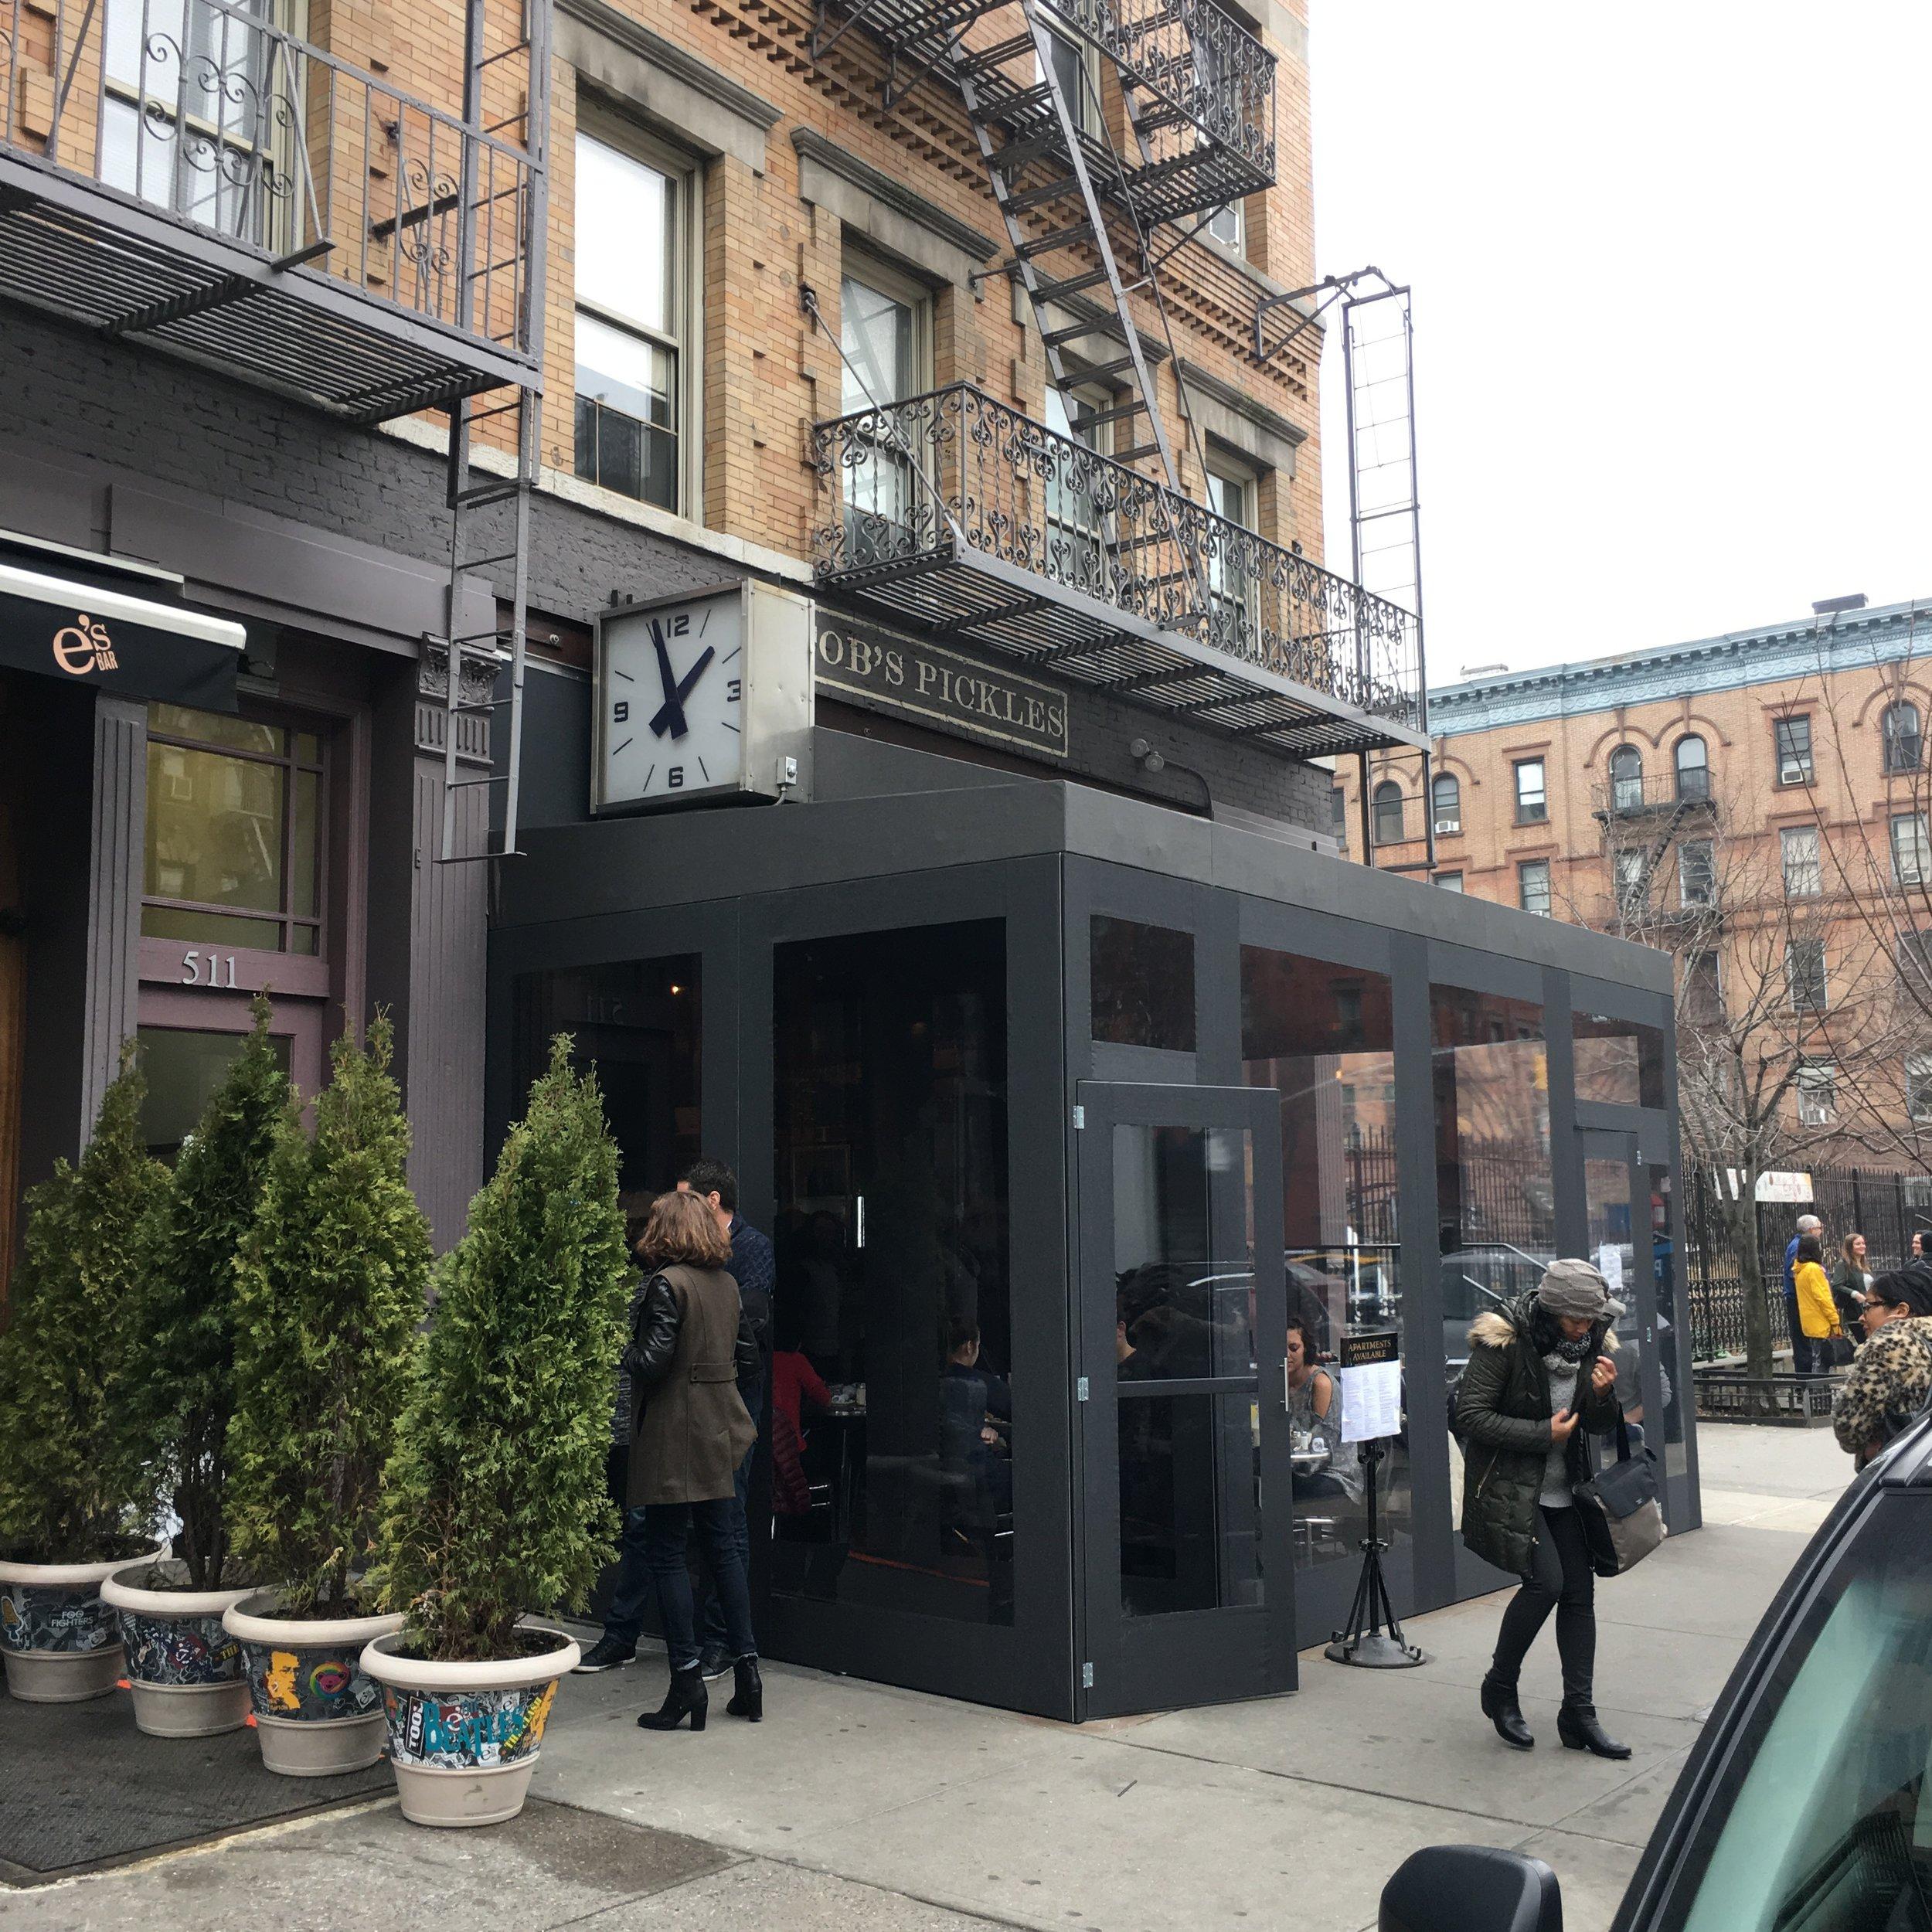 Exploring New York City on a Sunday